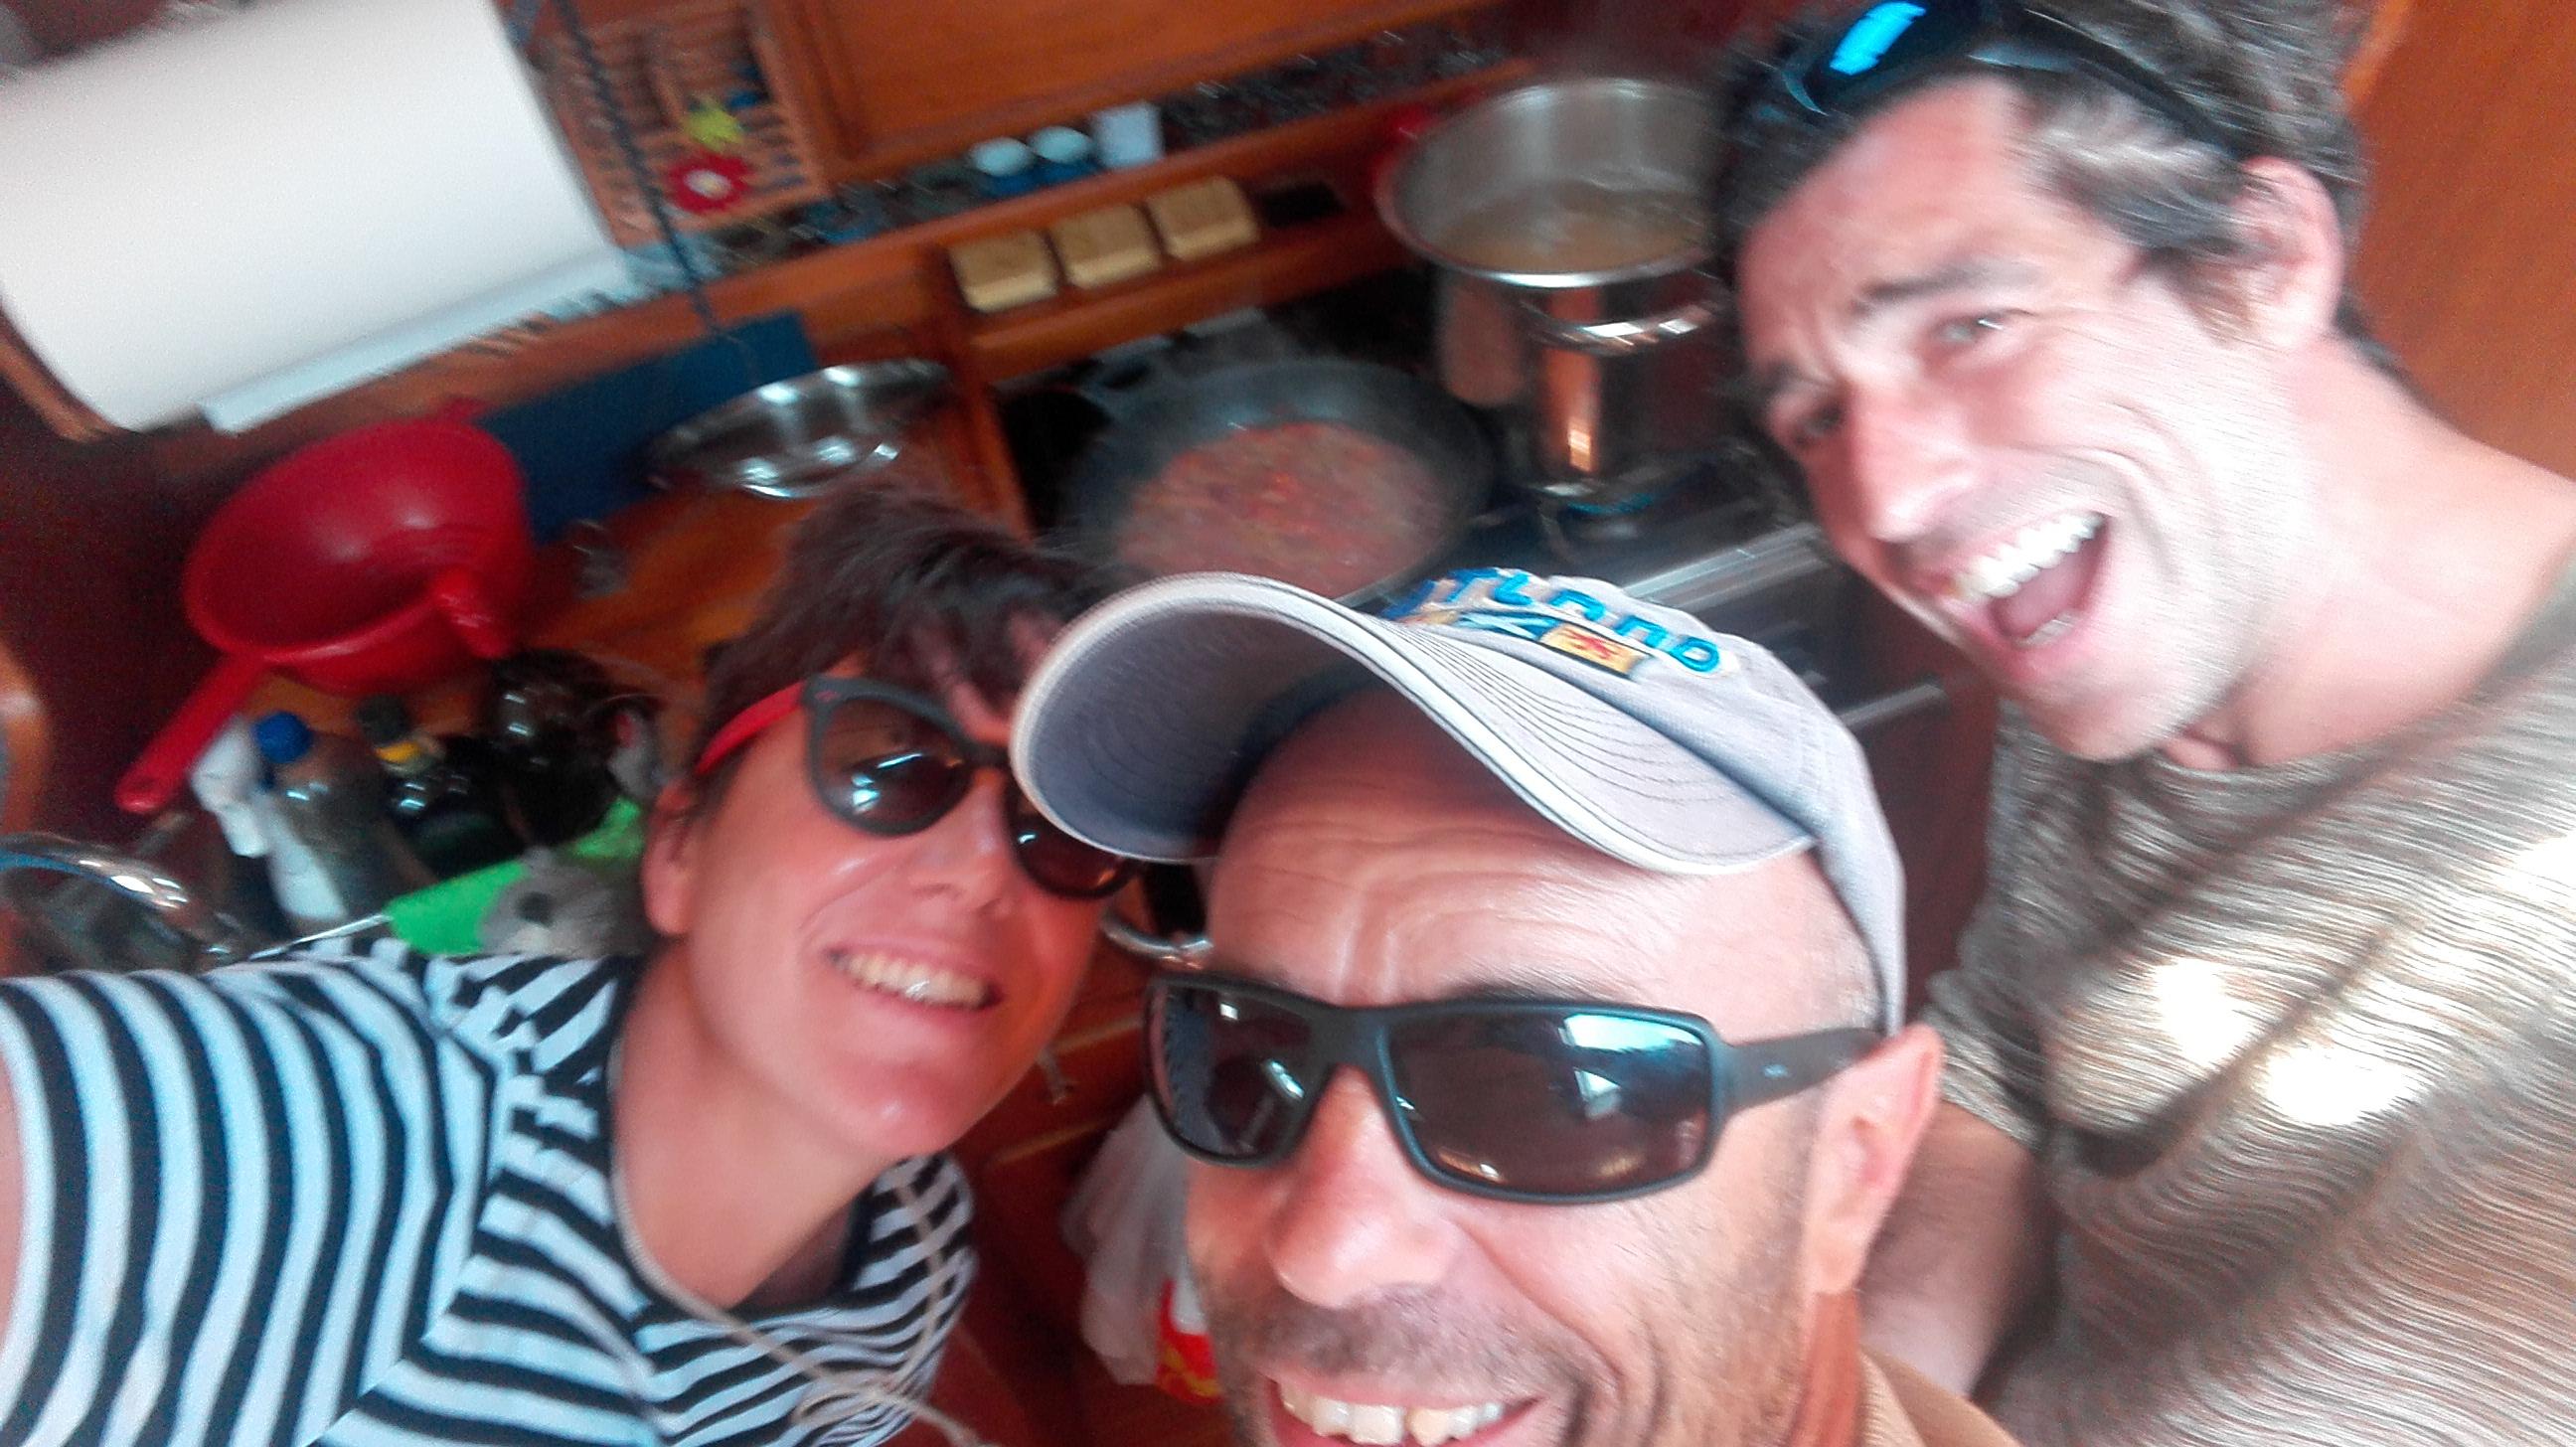 Week end in barca a Vela in Capraia 18 e 19 maggio